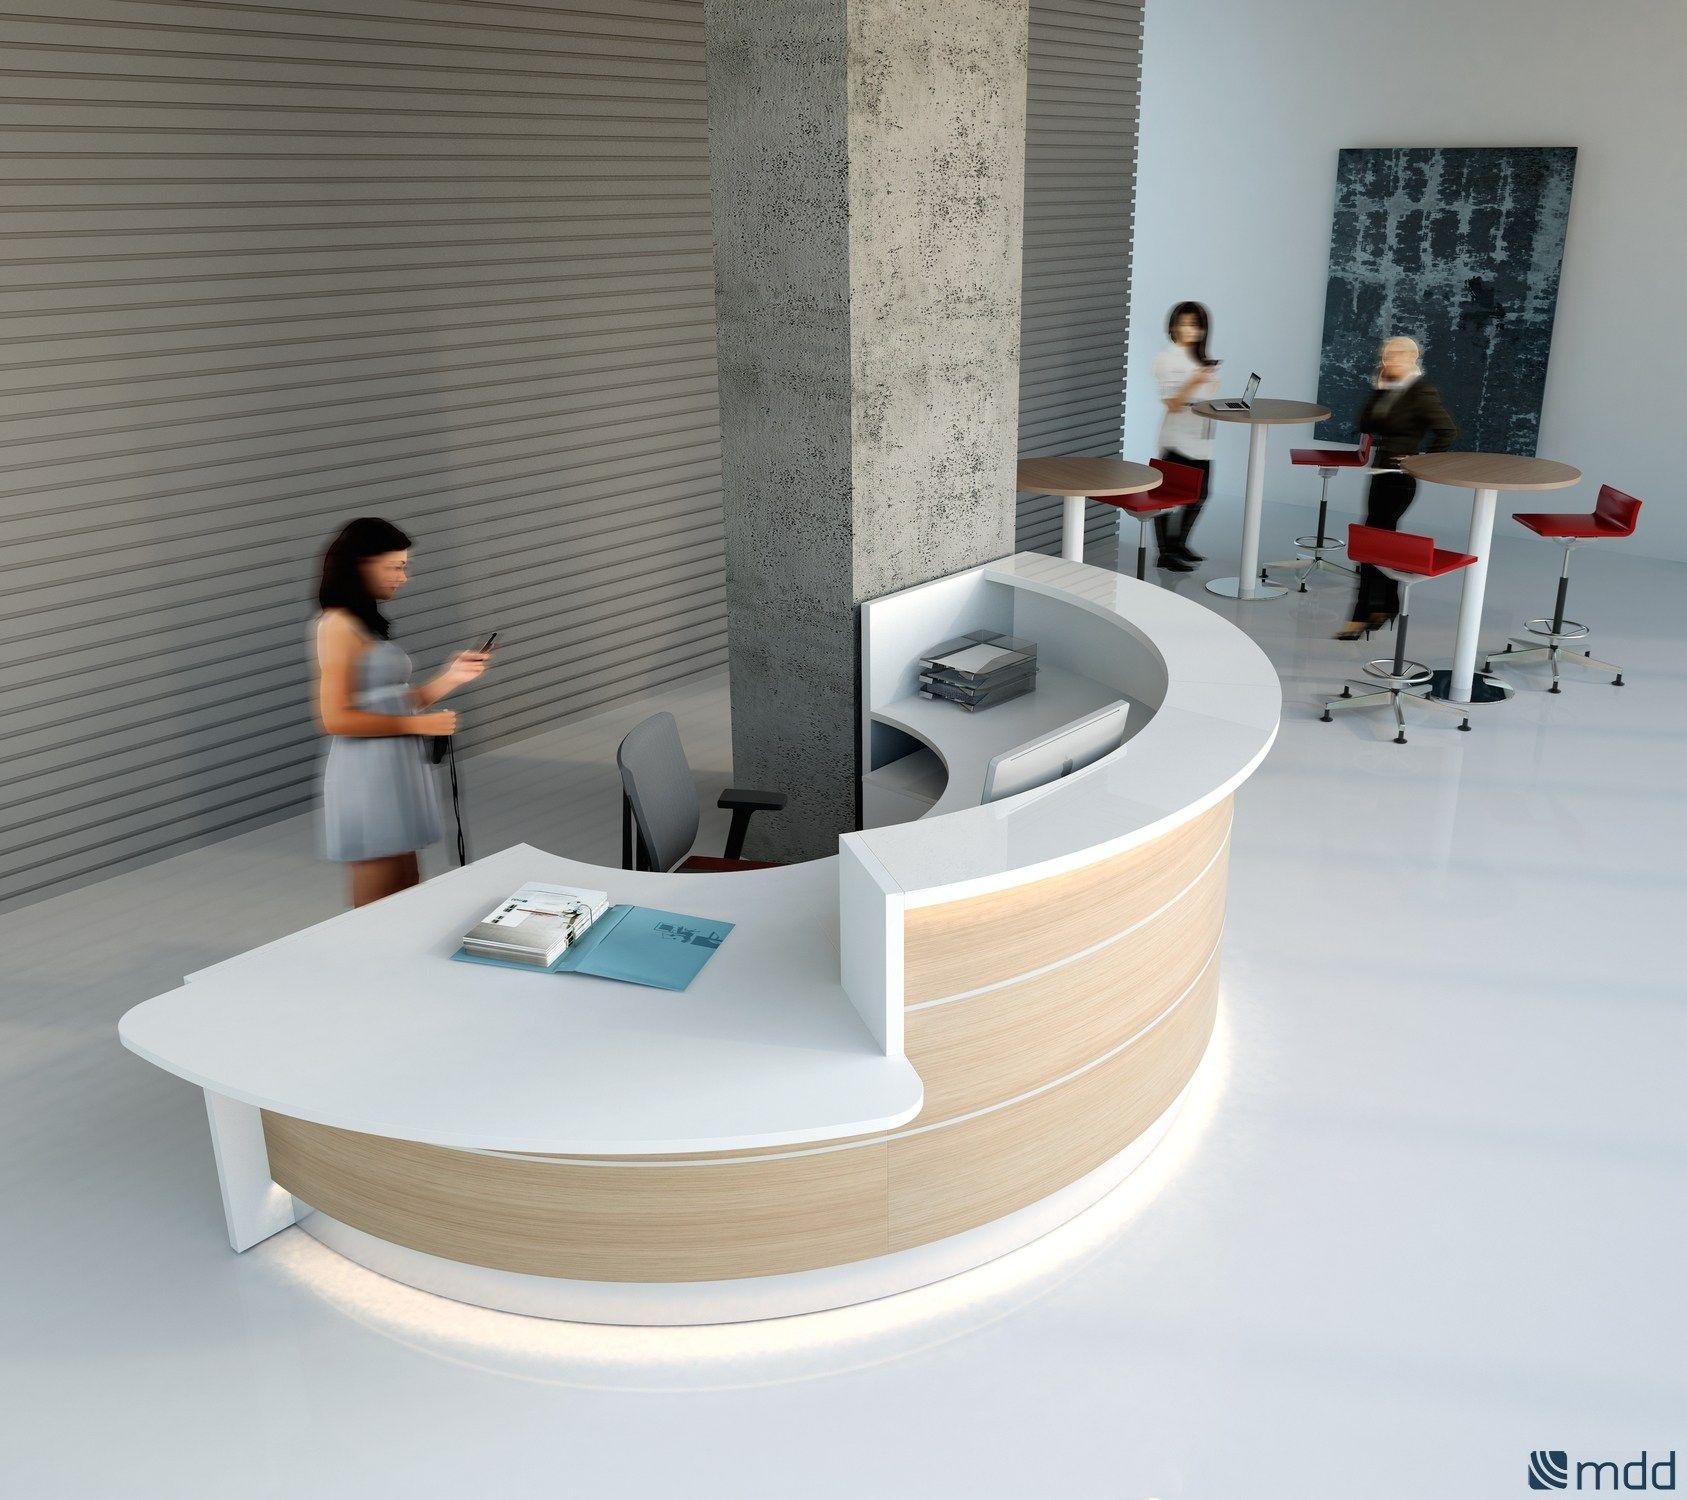 Valde Banque D Accueil De Bureau Modulable By Mdd Mesa Curva